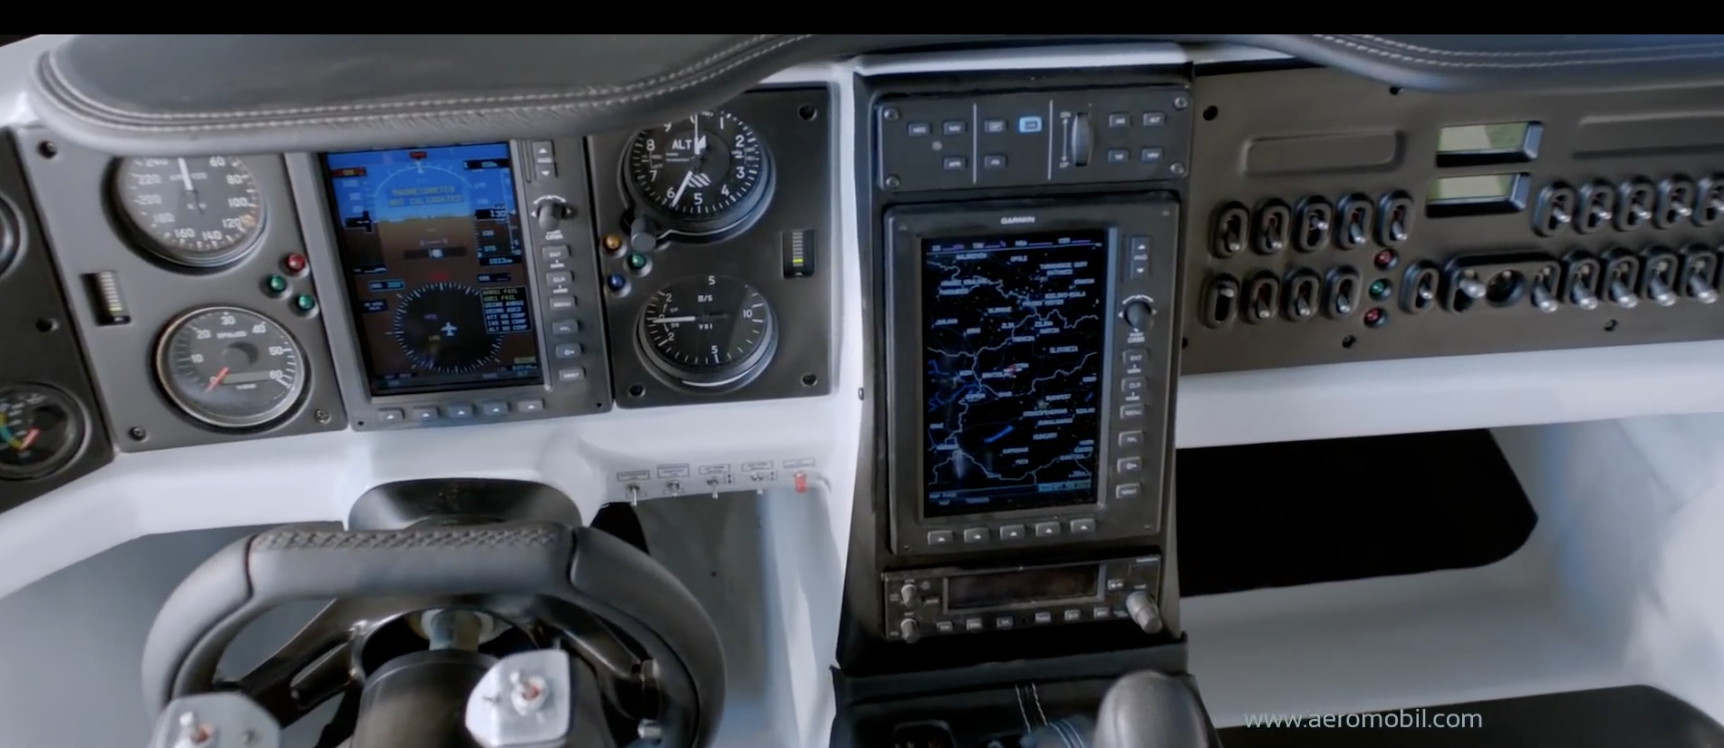 So sieht es im Cockpit des Aeromobils aus.